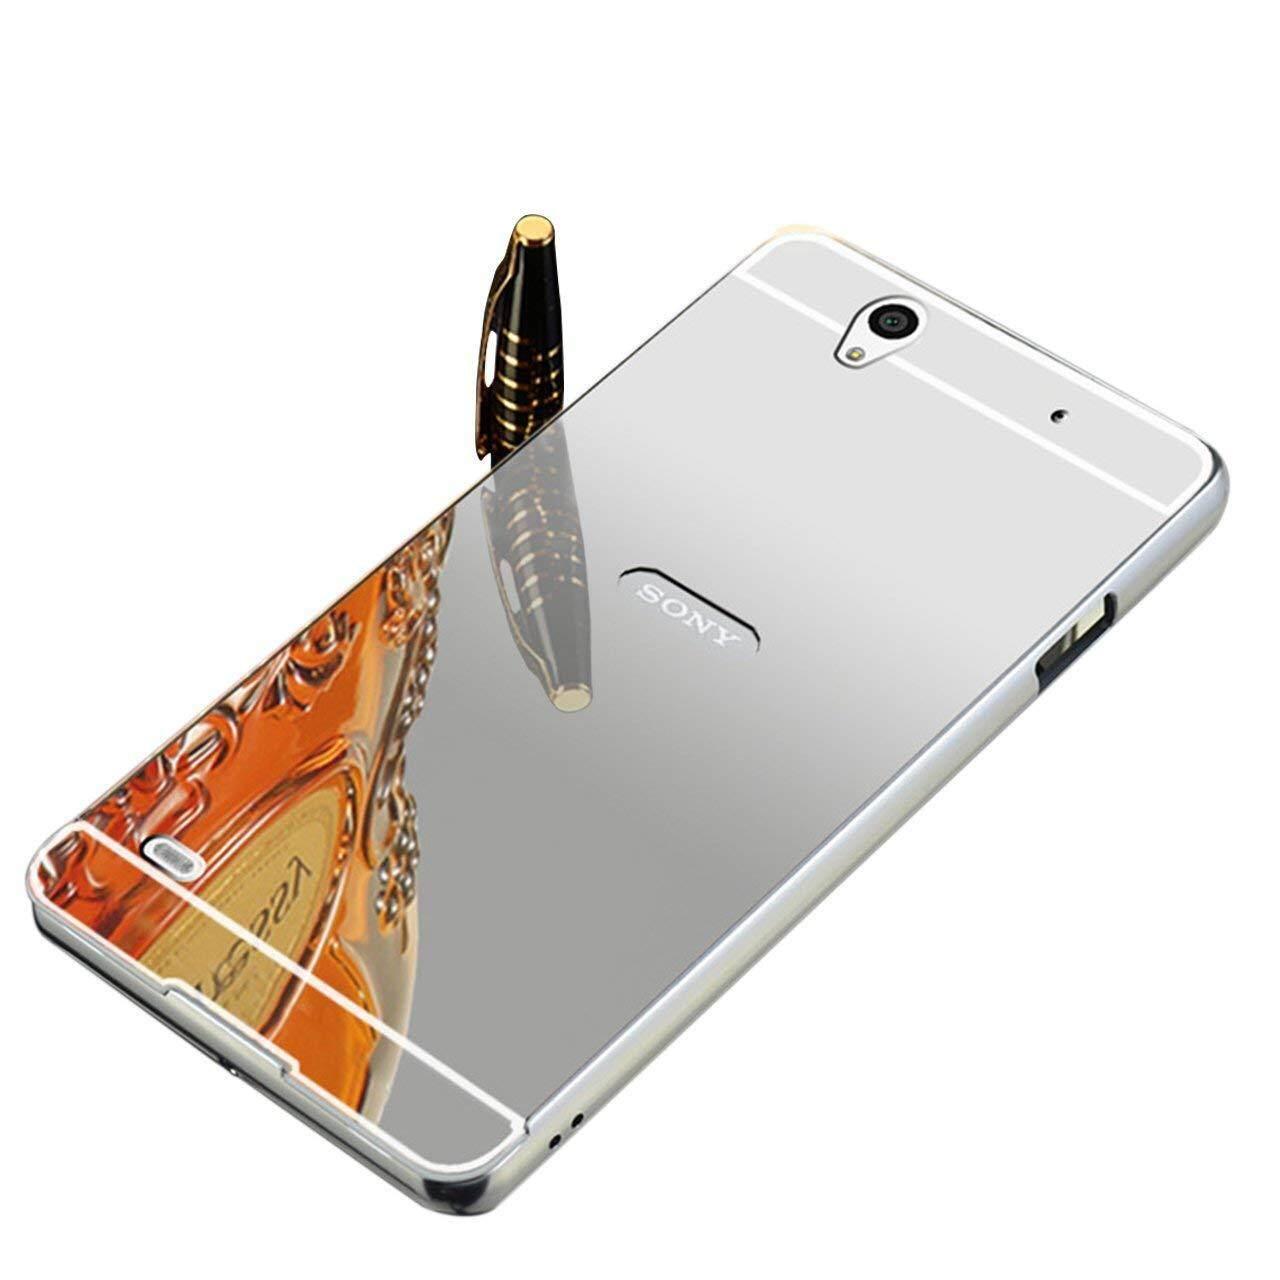 For Sony Xperia C4 Mirror Ultra Slim Metal Aluminum Bumper Frame Hard Cover Case